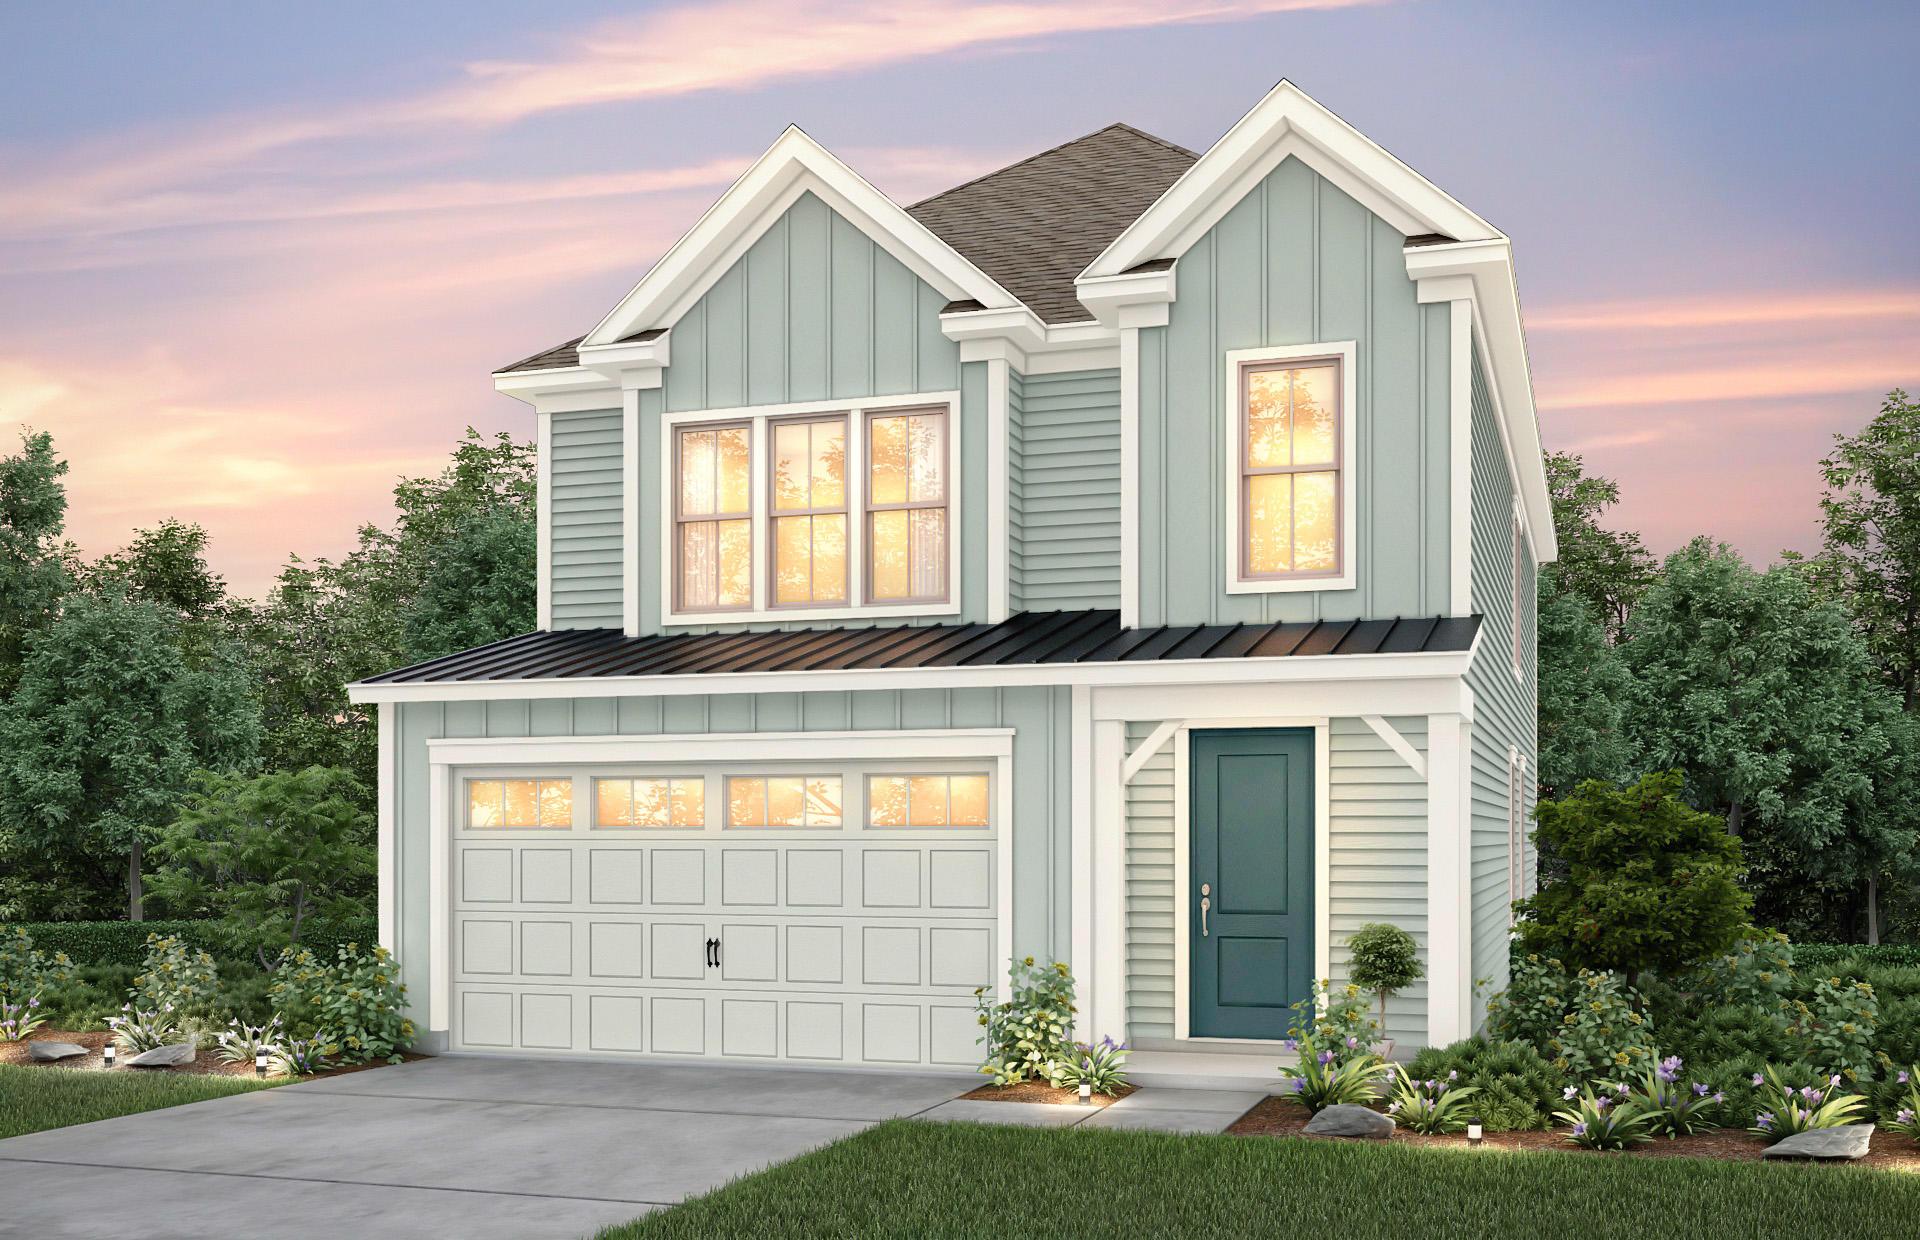 Pointe at Primus Homes For Sale - 2365 Primus, Mount Pleasant, SC - 0